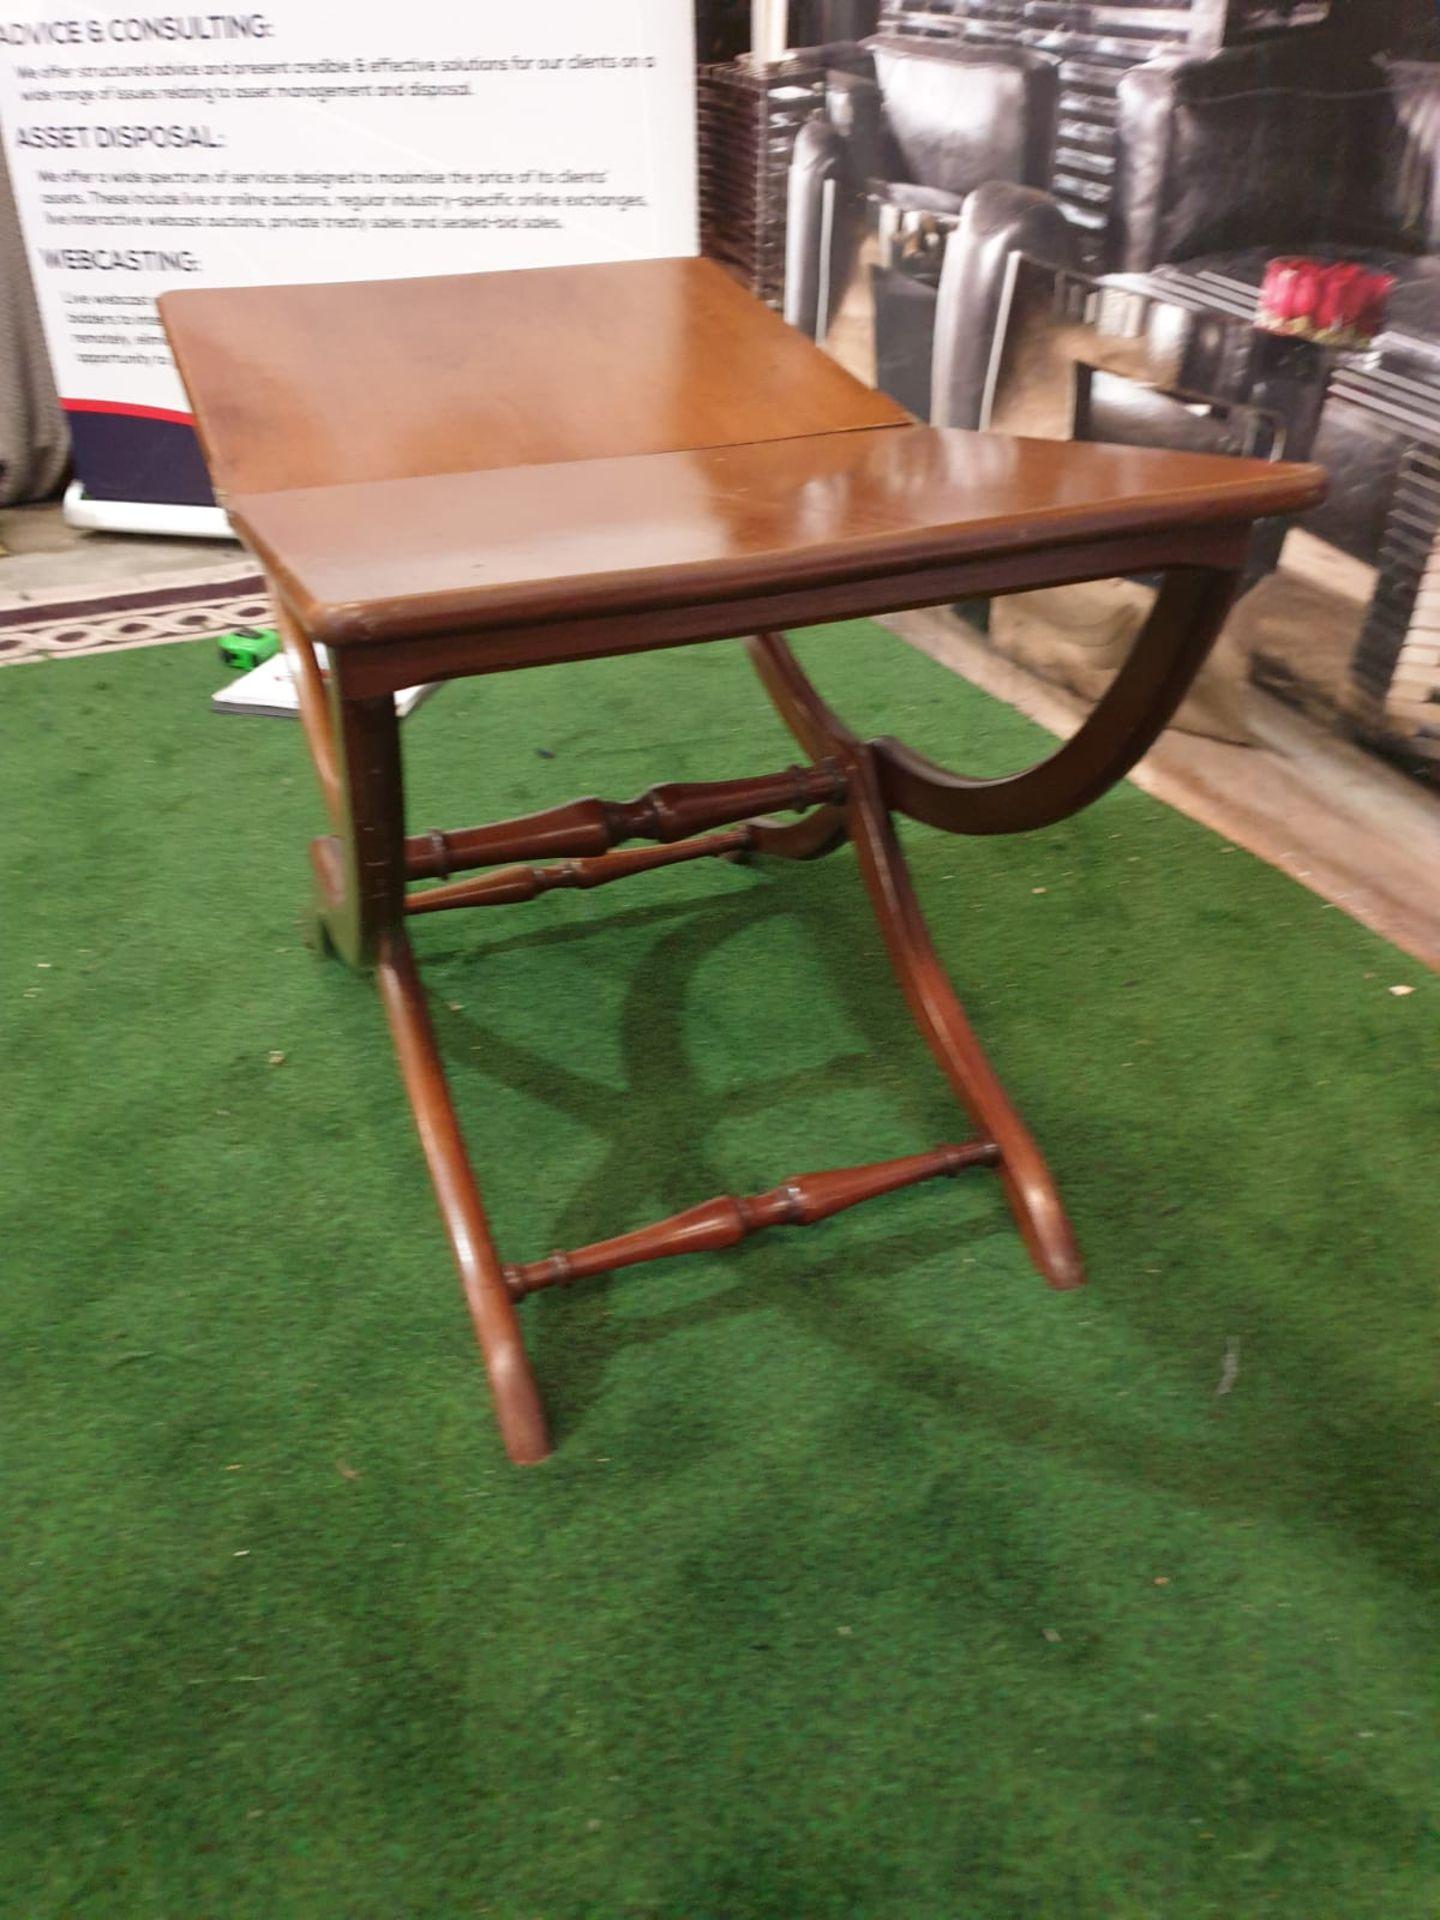 A polished mahogany folding table 76 x 43 x 49cm (Nb bar latch missing) - Image 3 of 5